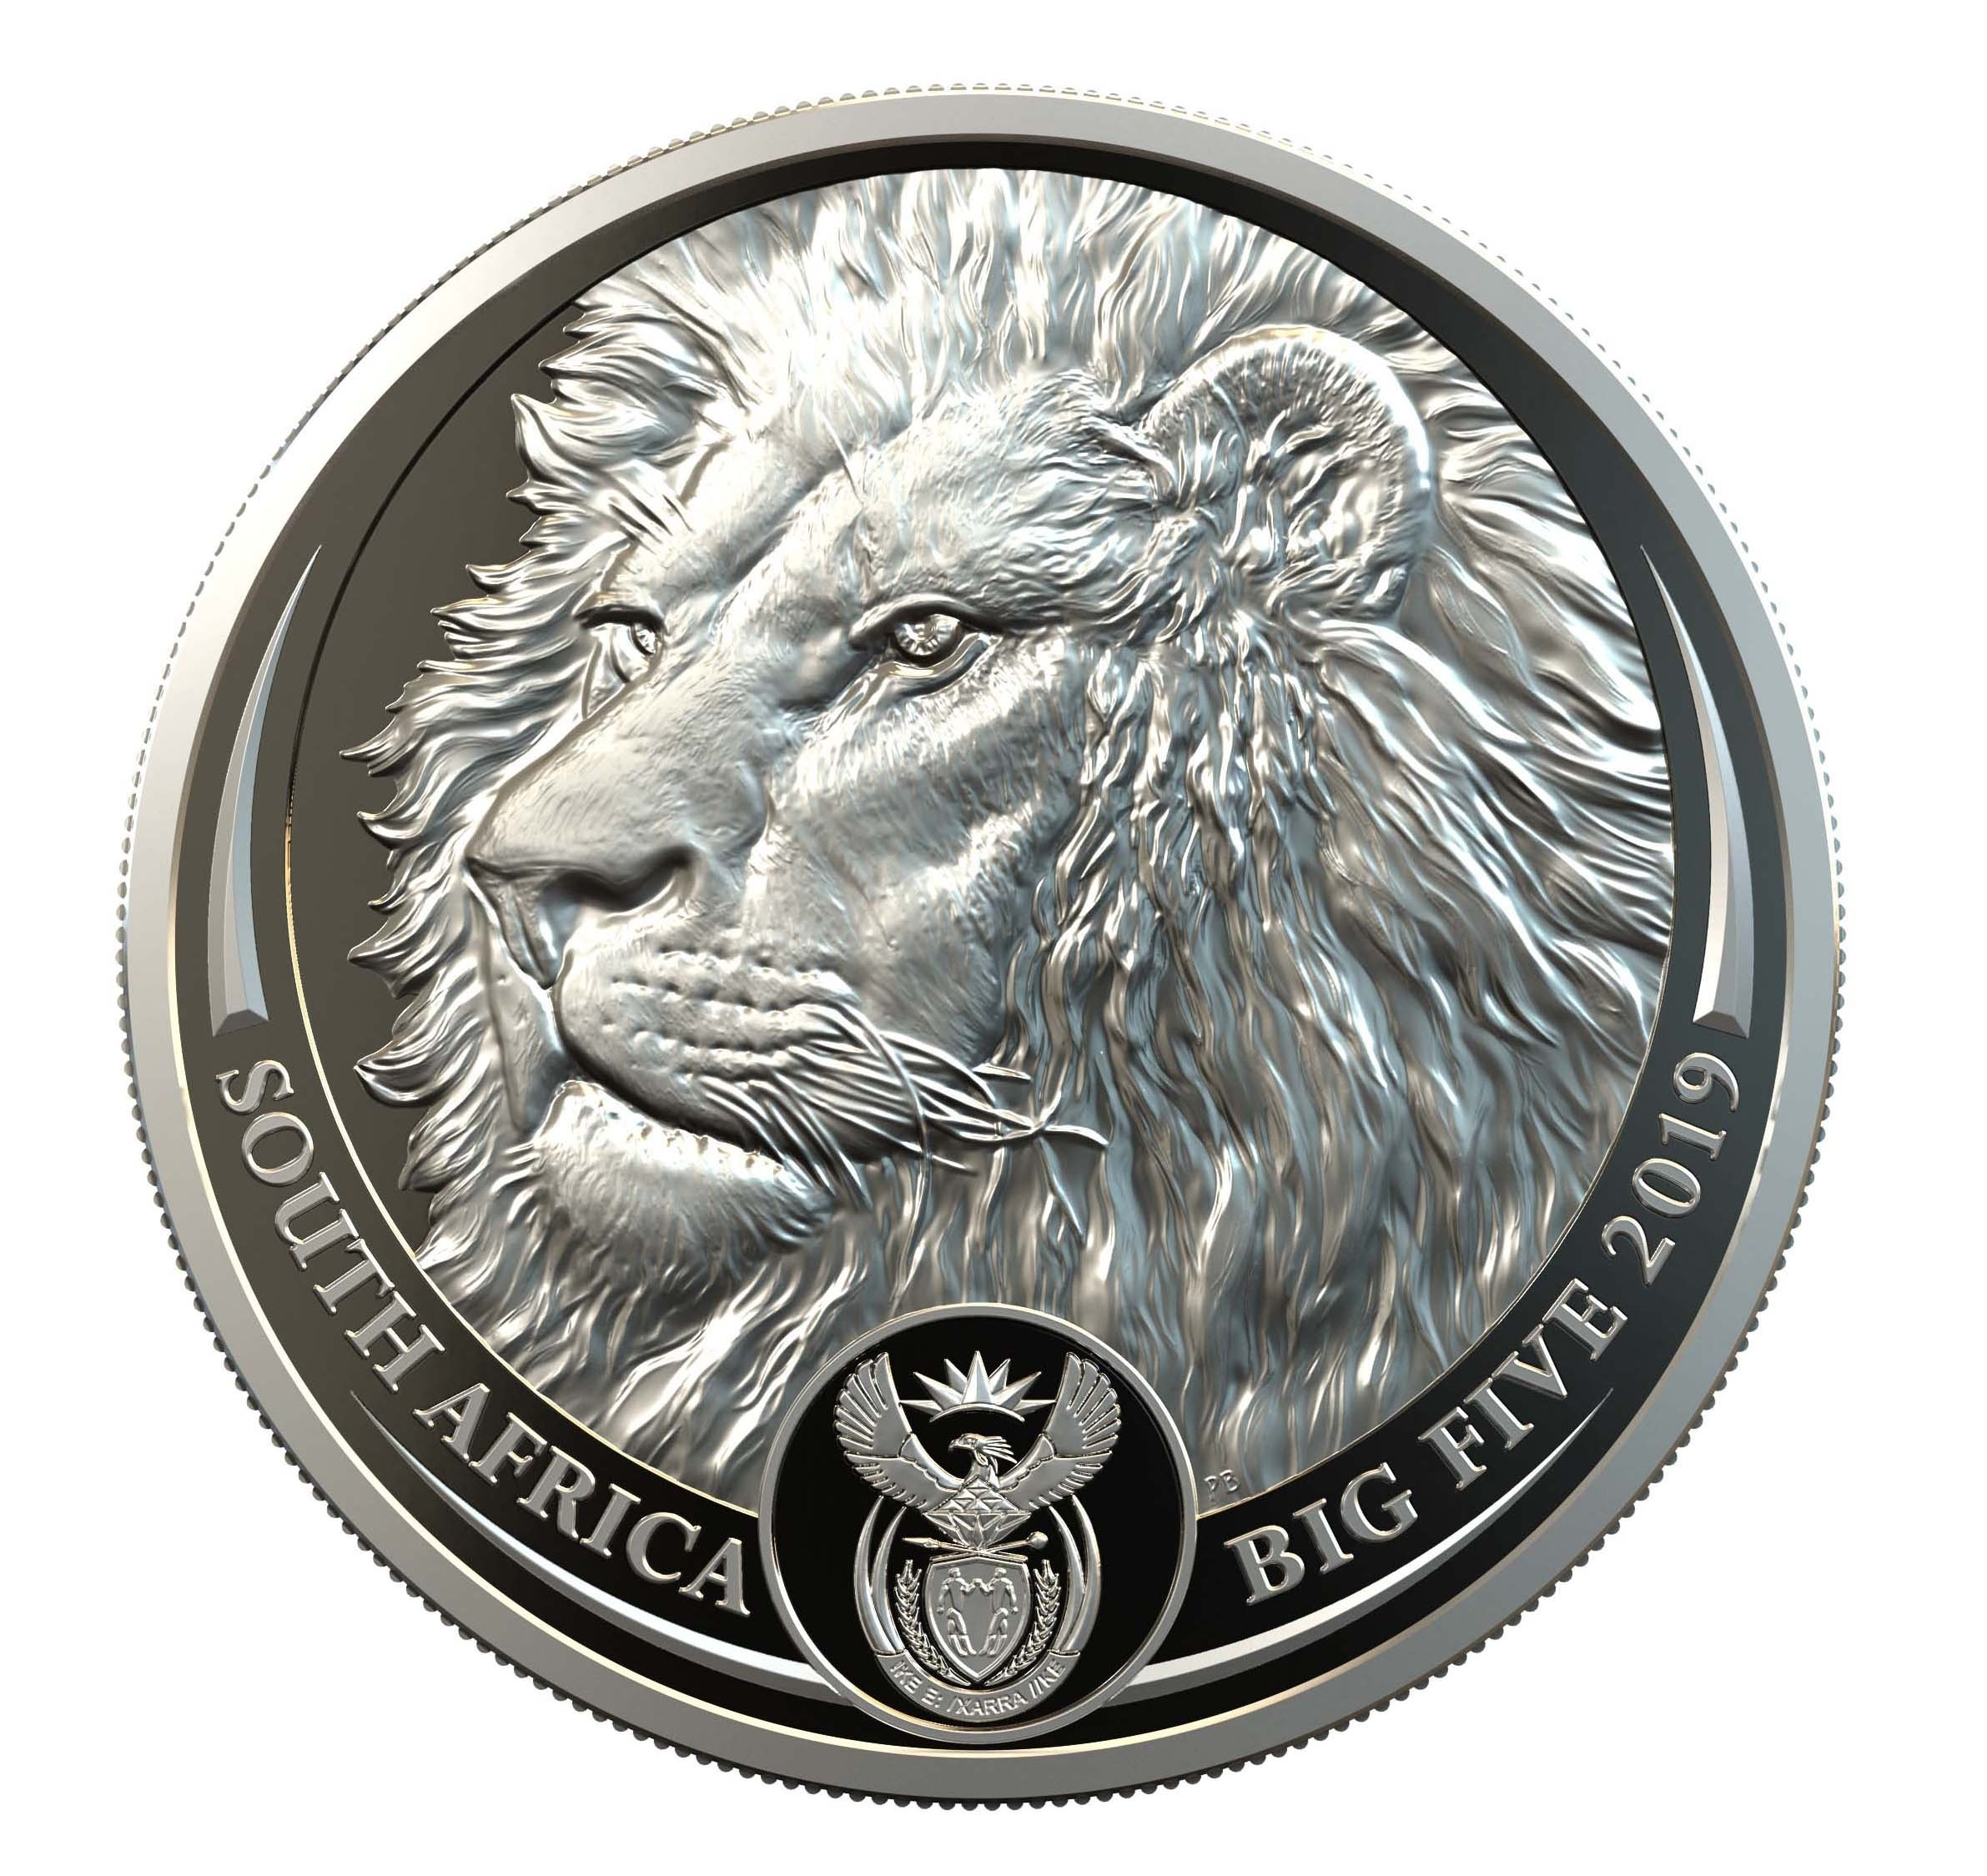 Lion Platina 1 Ounce 2019 PROOF |  Hoofdzijde | goud999